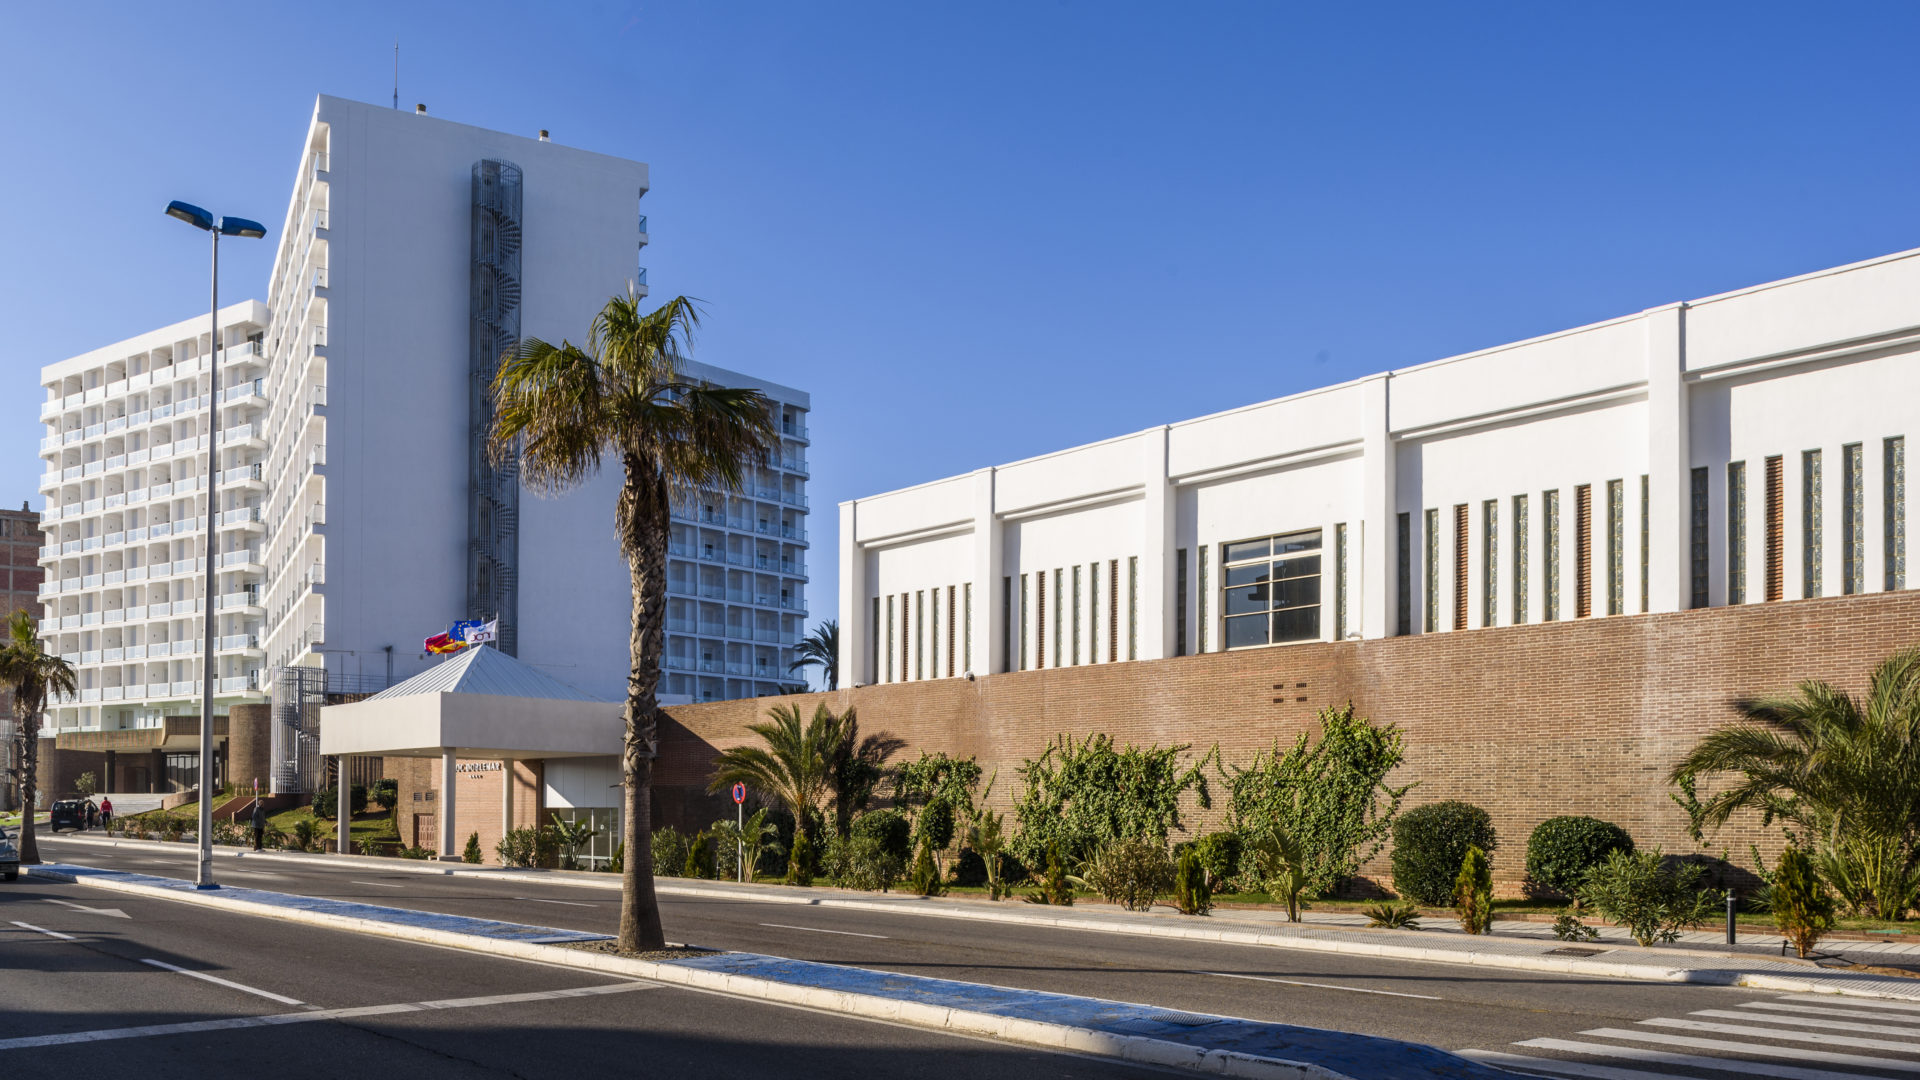 Hotel Doblemar 2-041-La Manga Urdecon